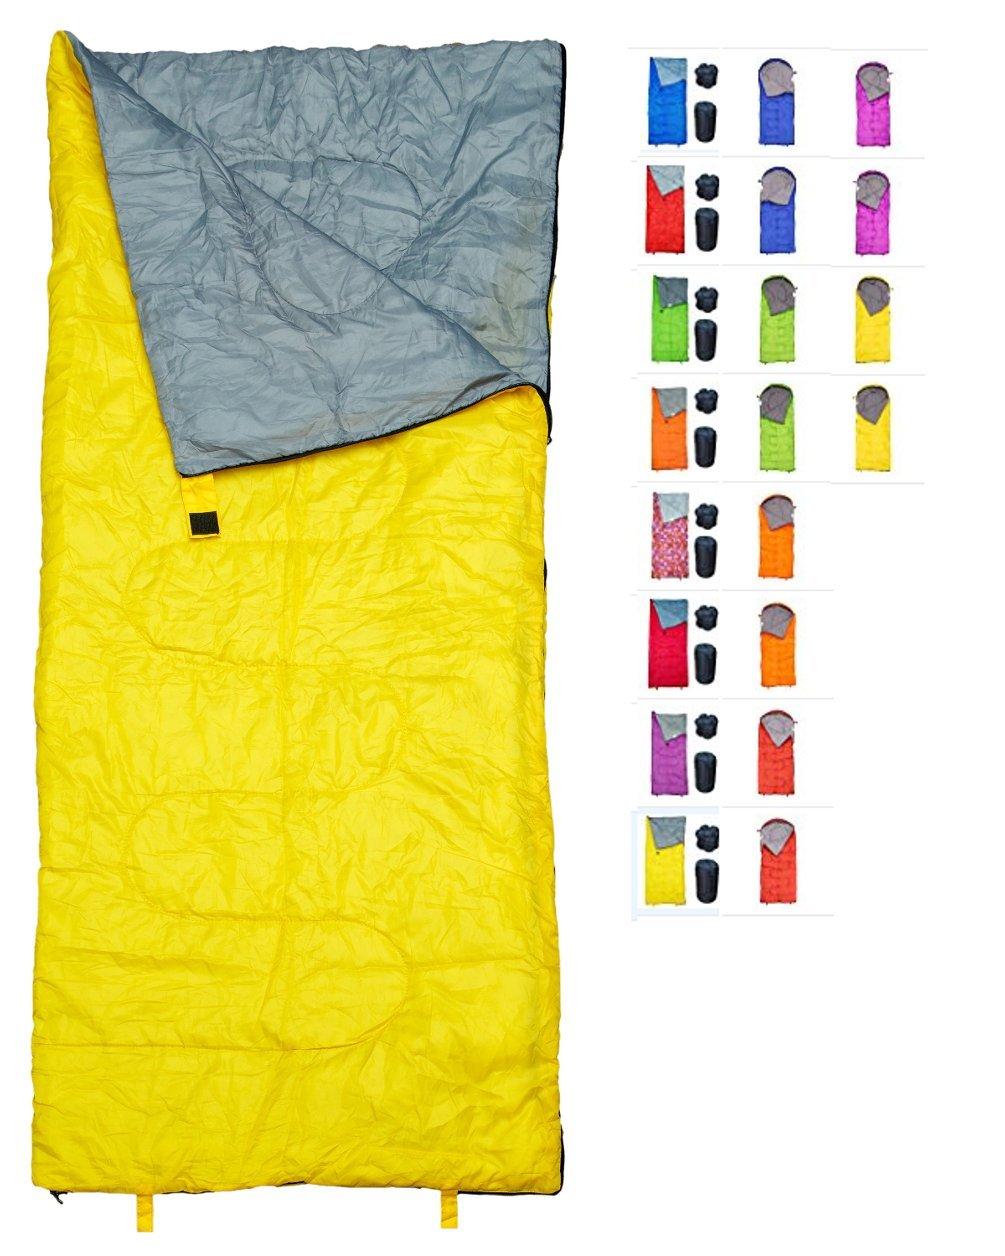 REVALCAMP Lightweight Sleeping Bag